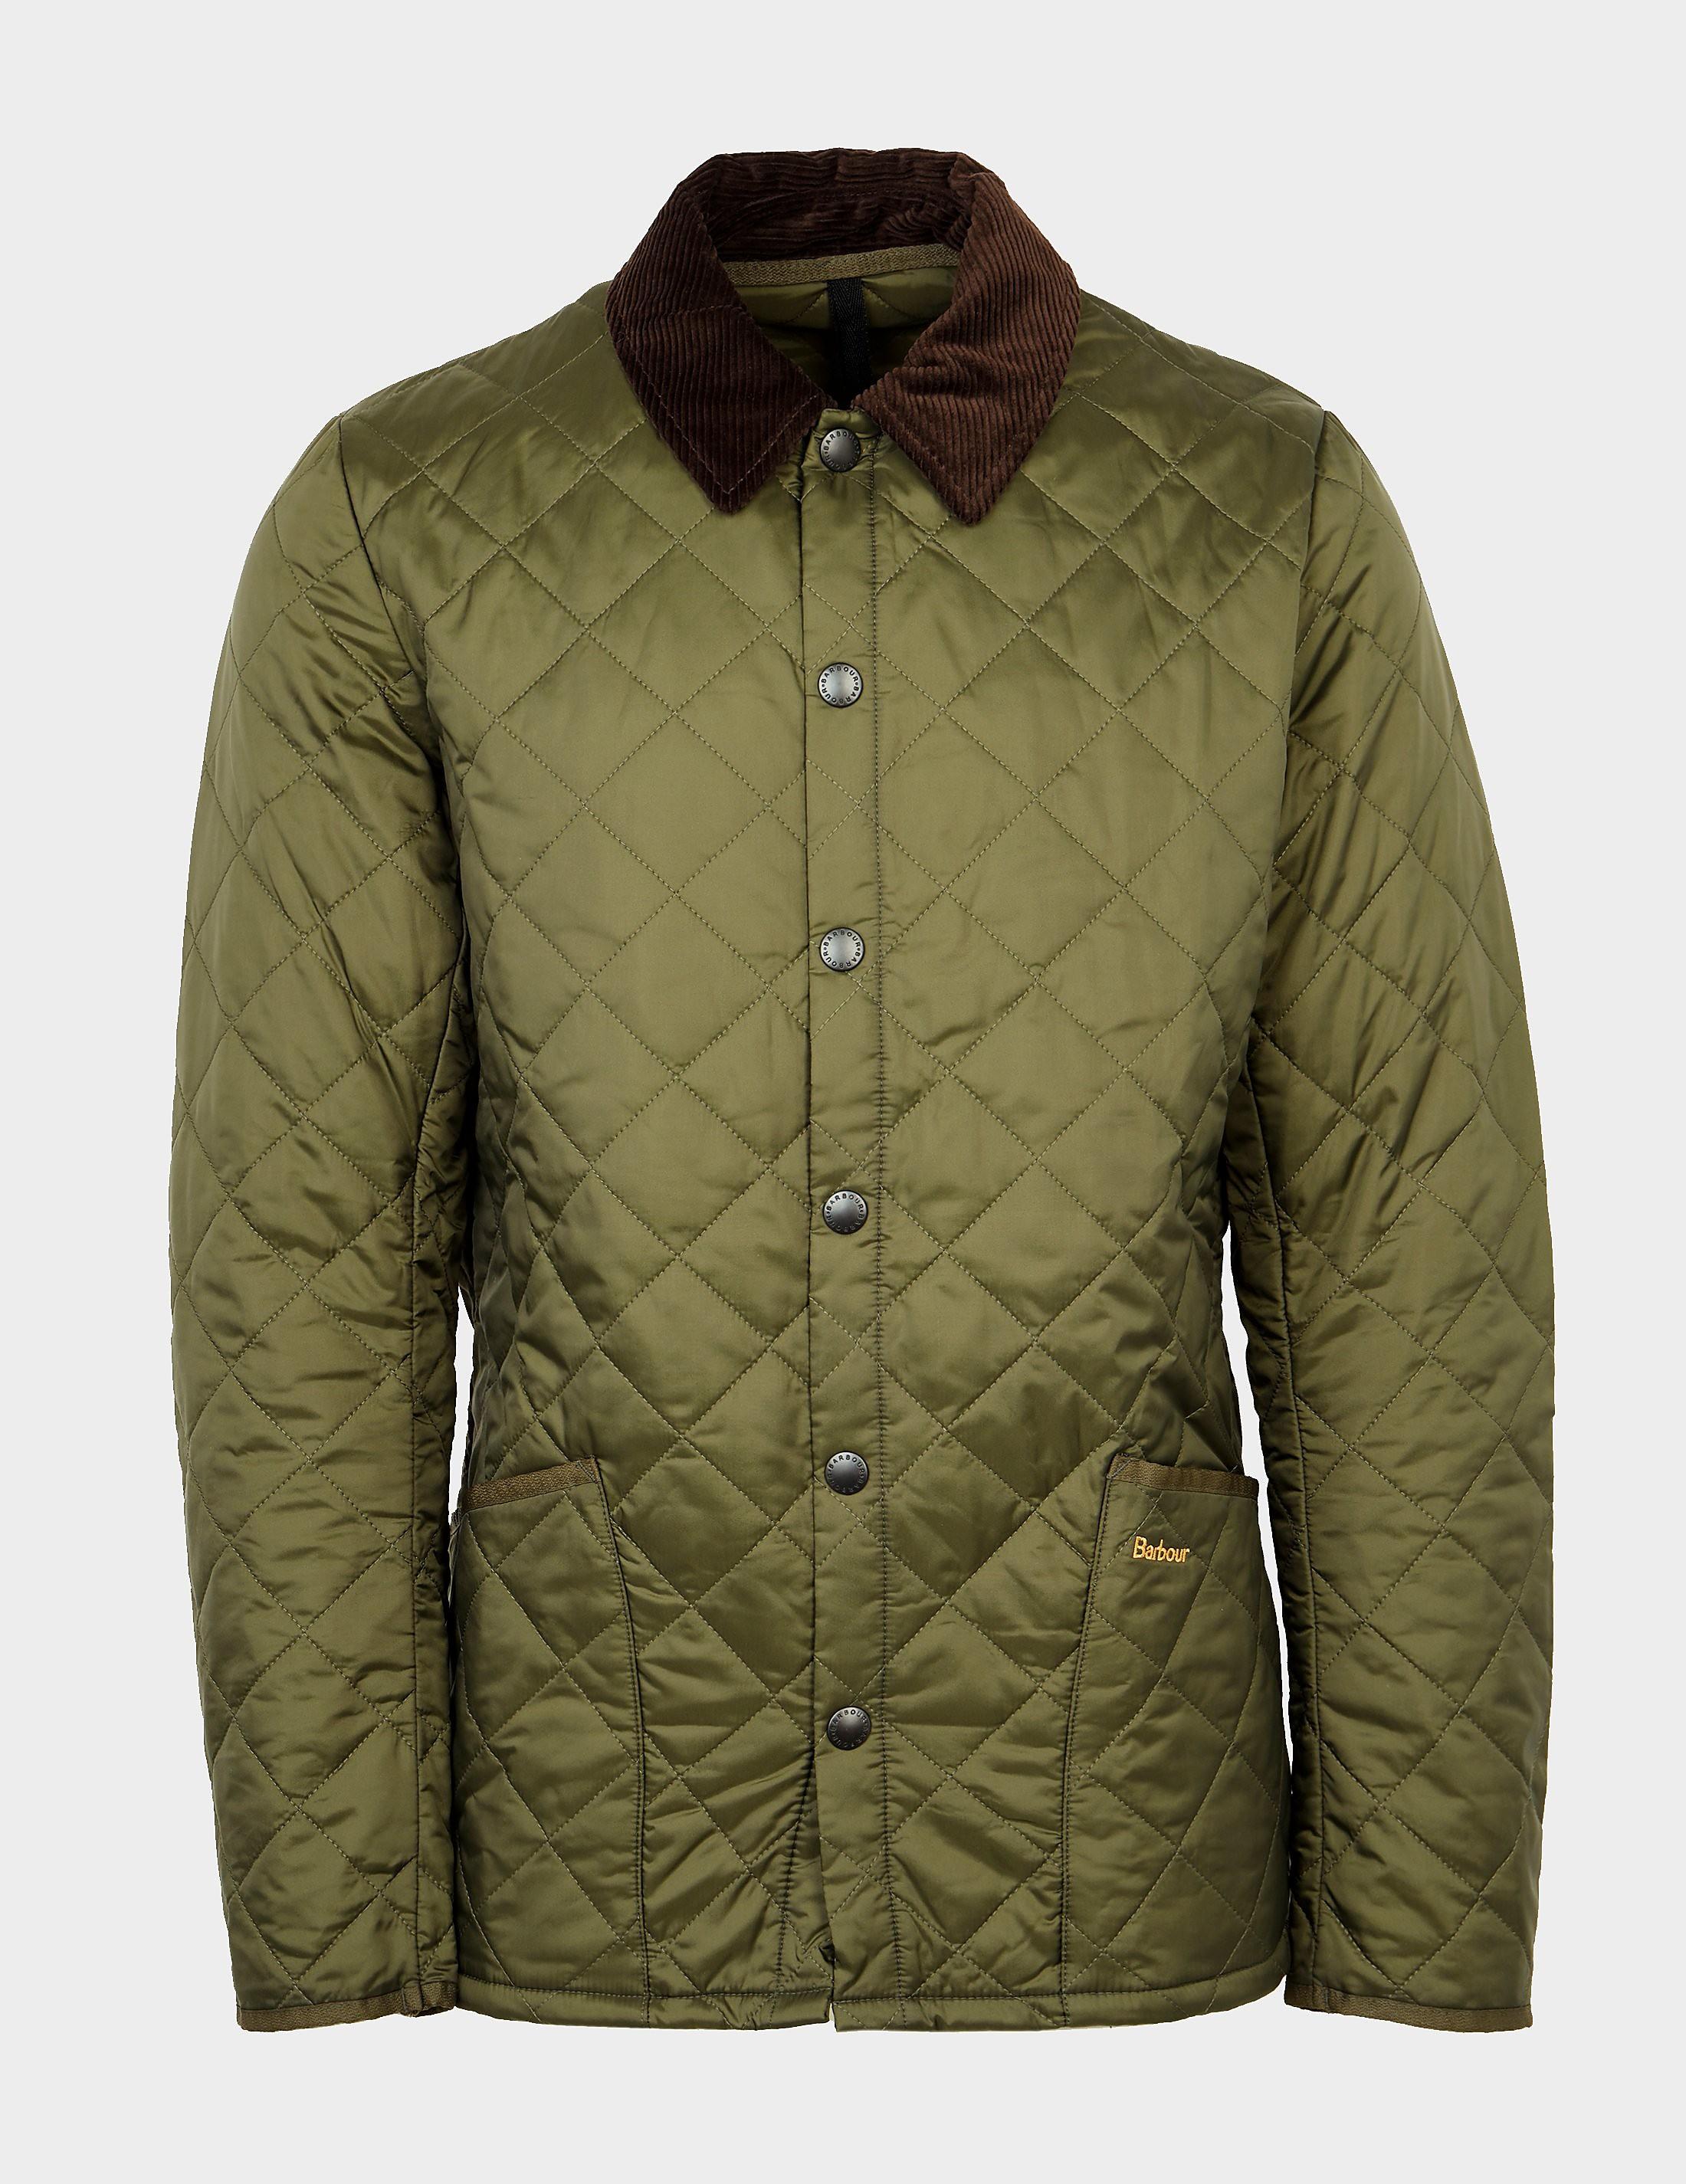 Barbour Heritage Liddesdale Jacket